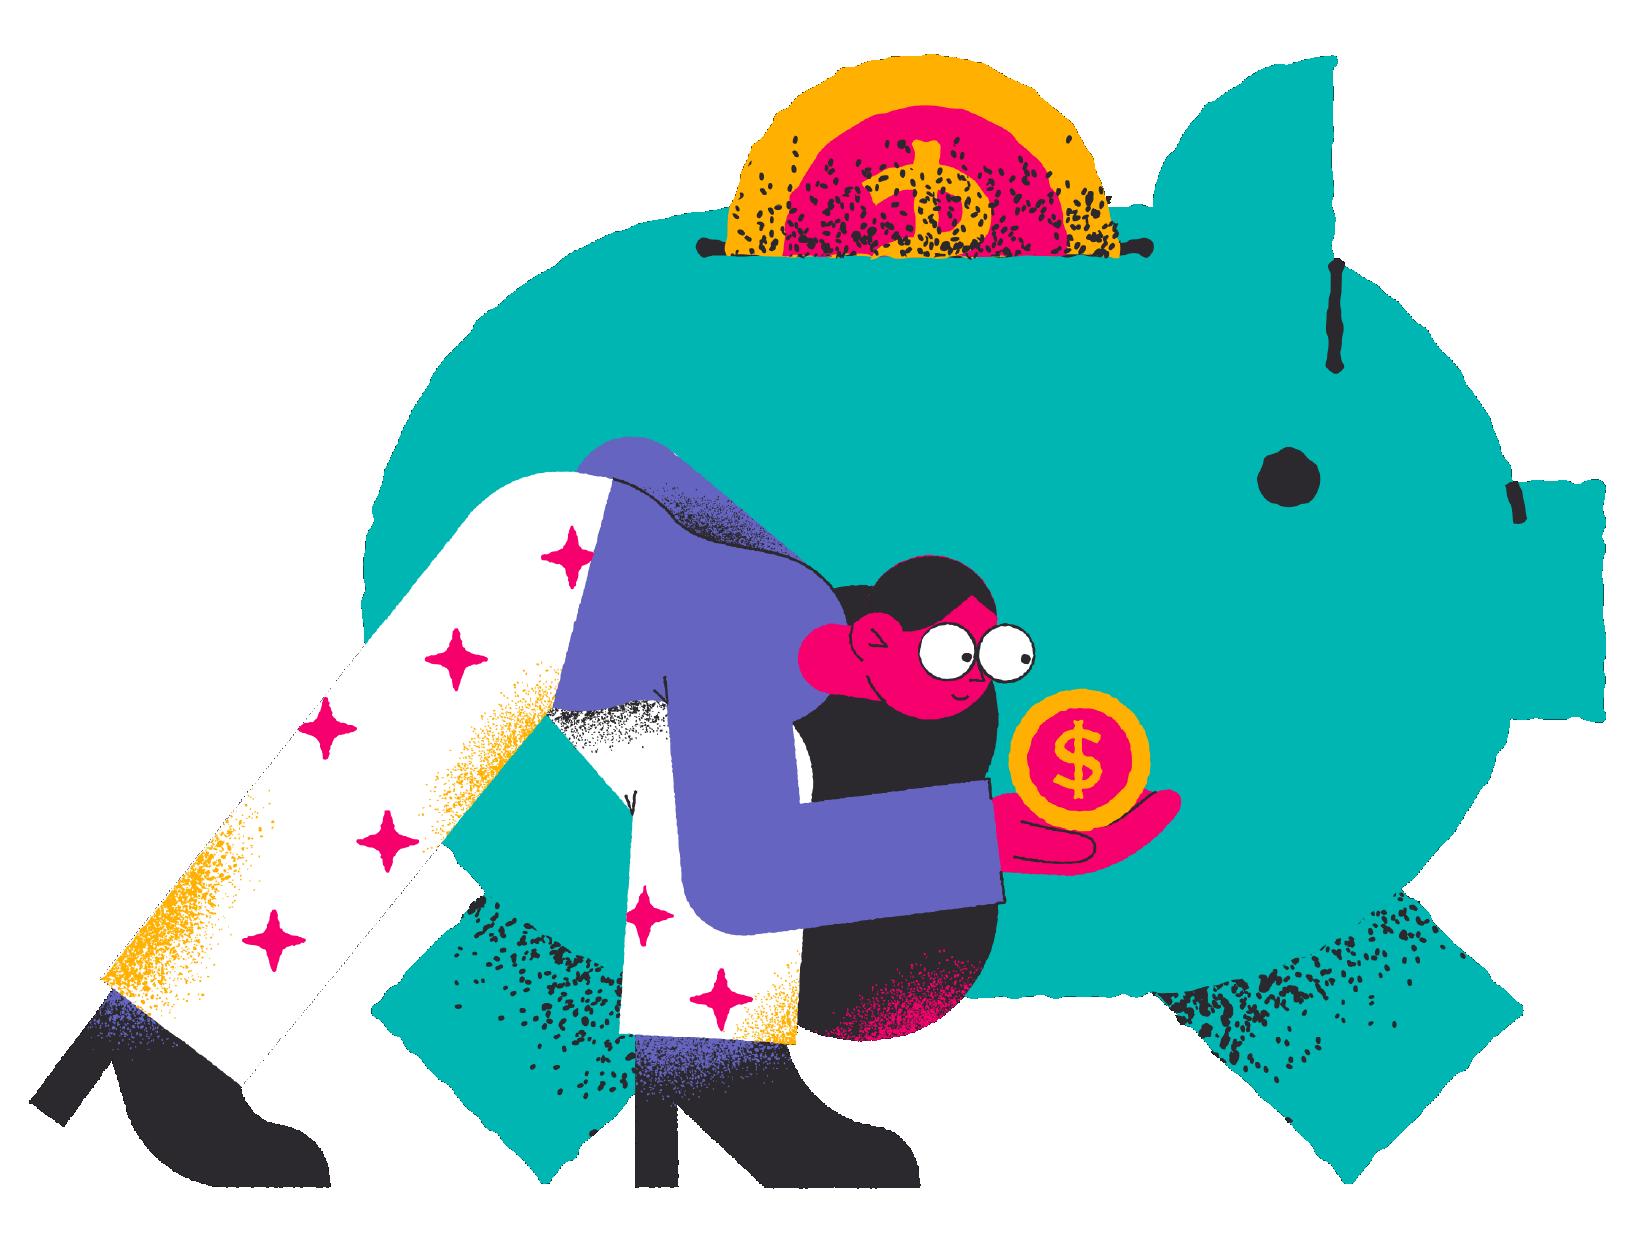 piggy-bank_illustration@4x